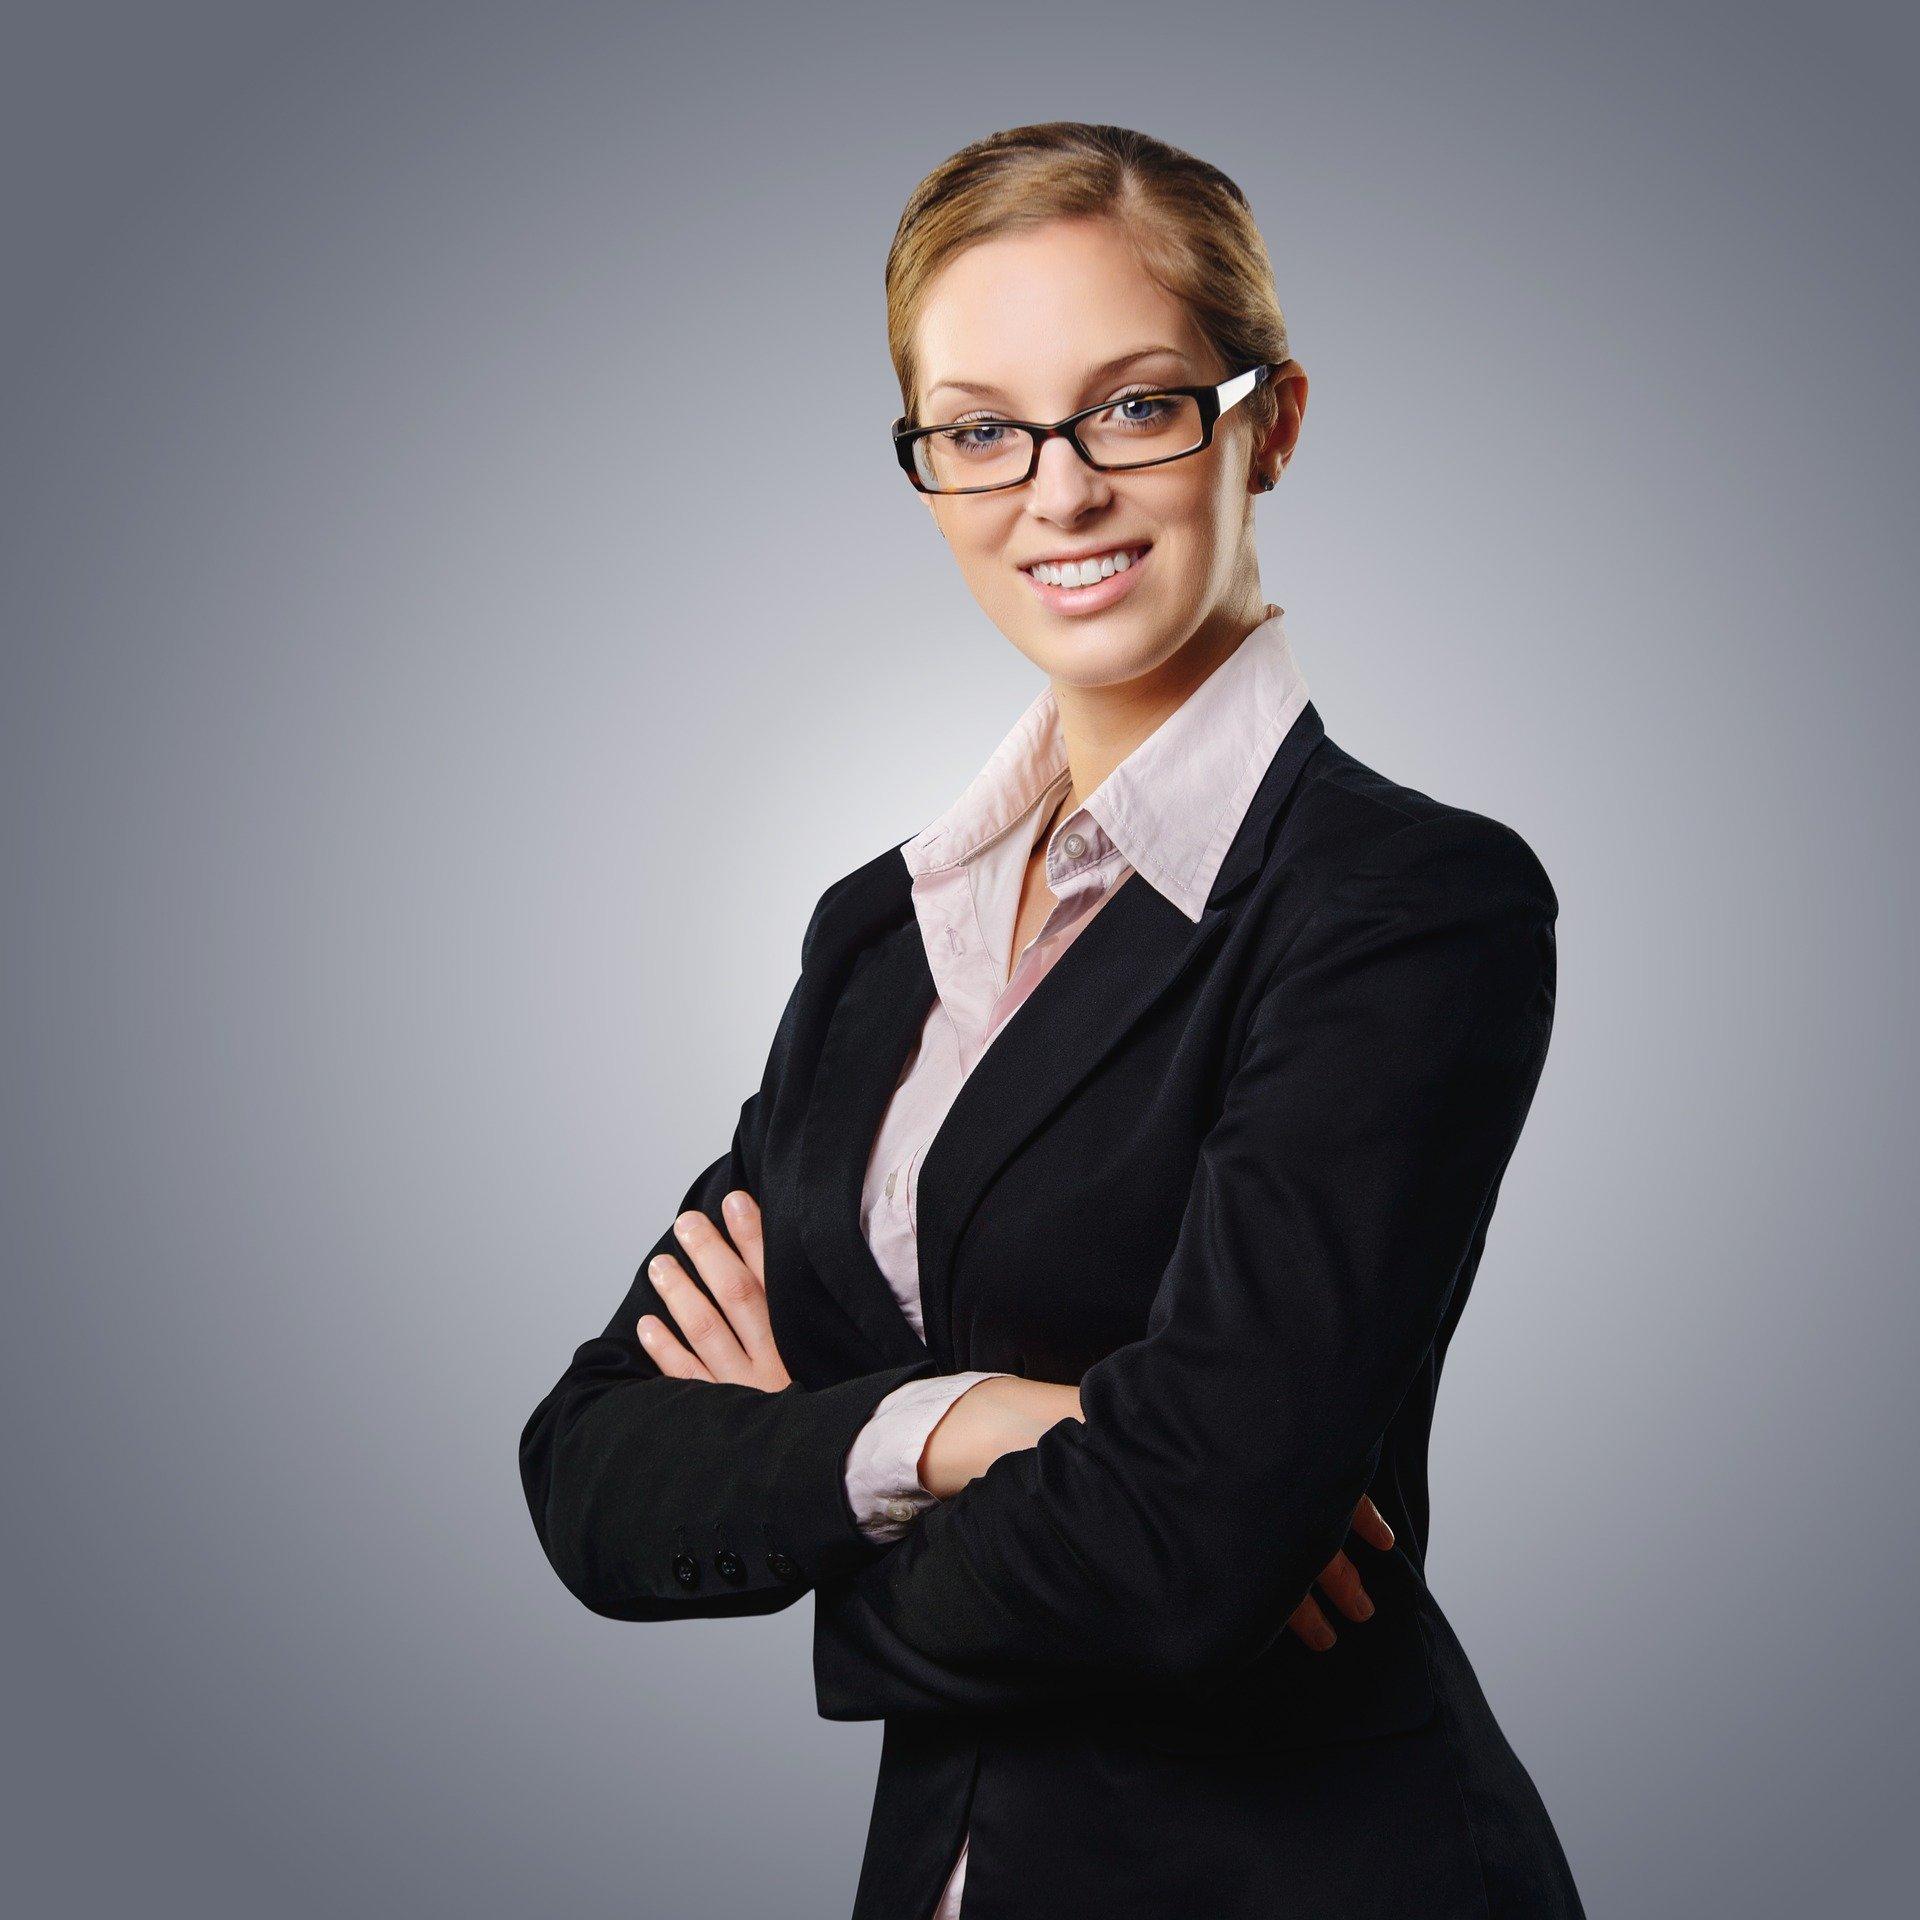 business-woman-2697954_1920.jpg